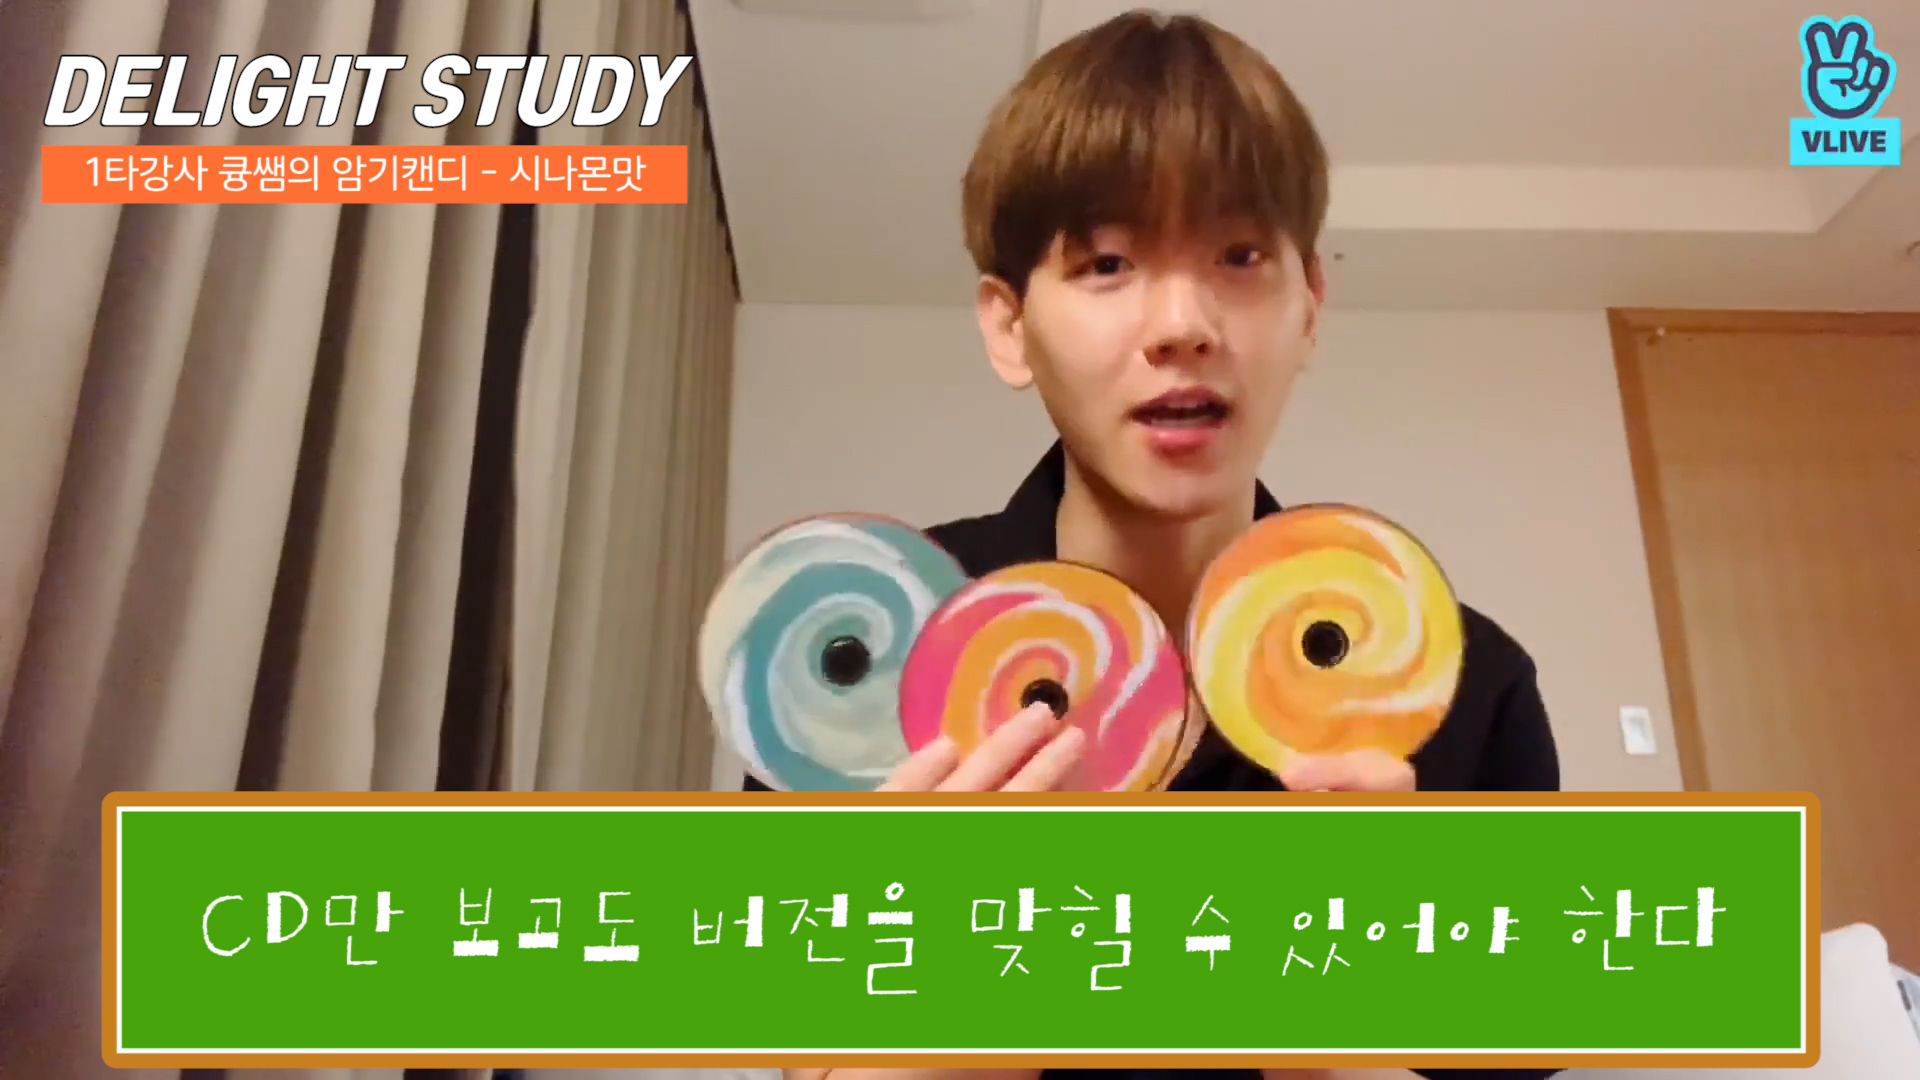 [EXO] 내 이름은 백현‼️ 임금 겸 선생님 겸 치과의사죠 s( 'ㅅ' )z✨ (BAEKHYUN unboxing his new album 'Delight')